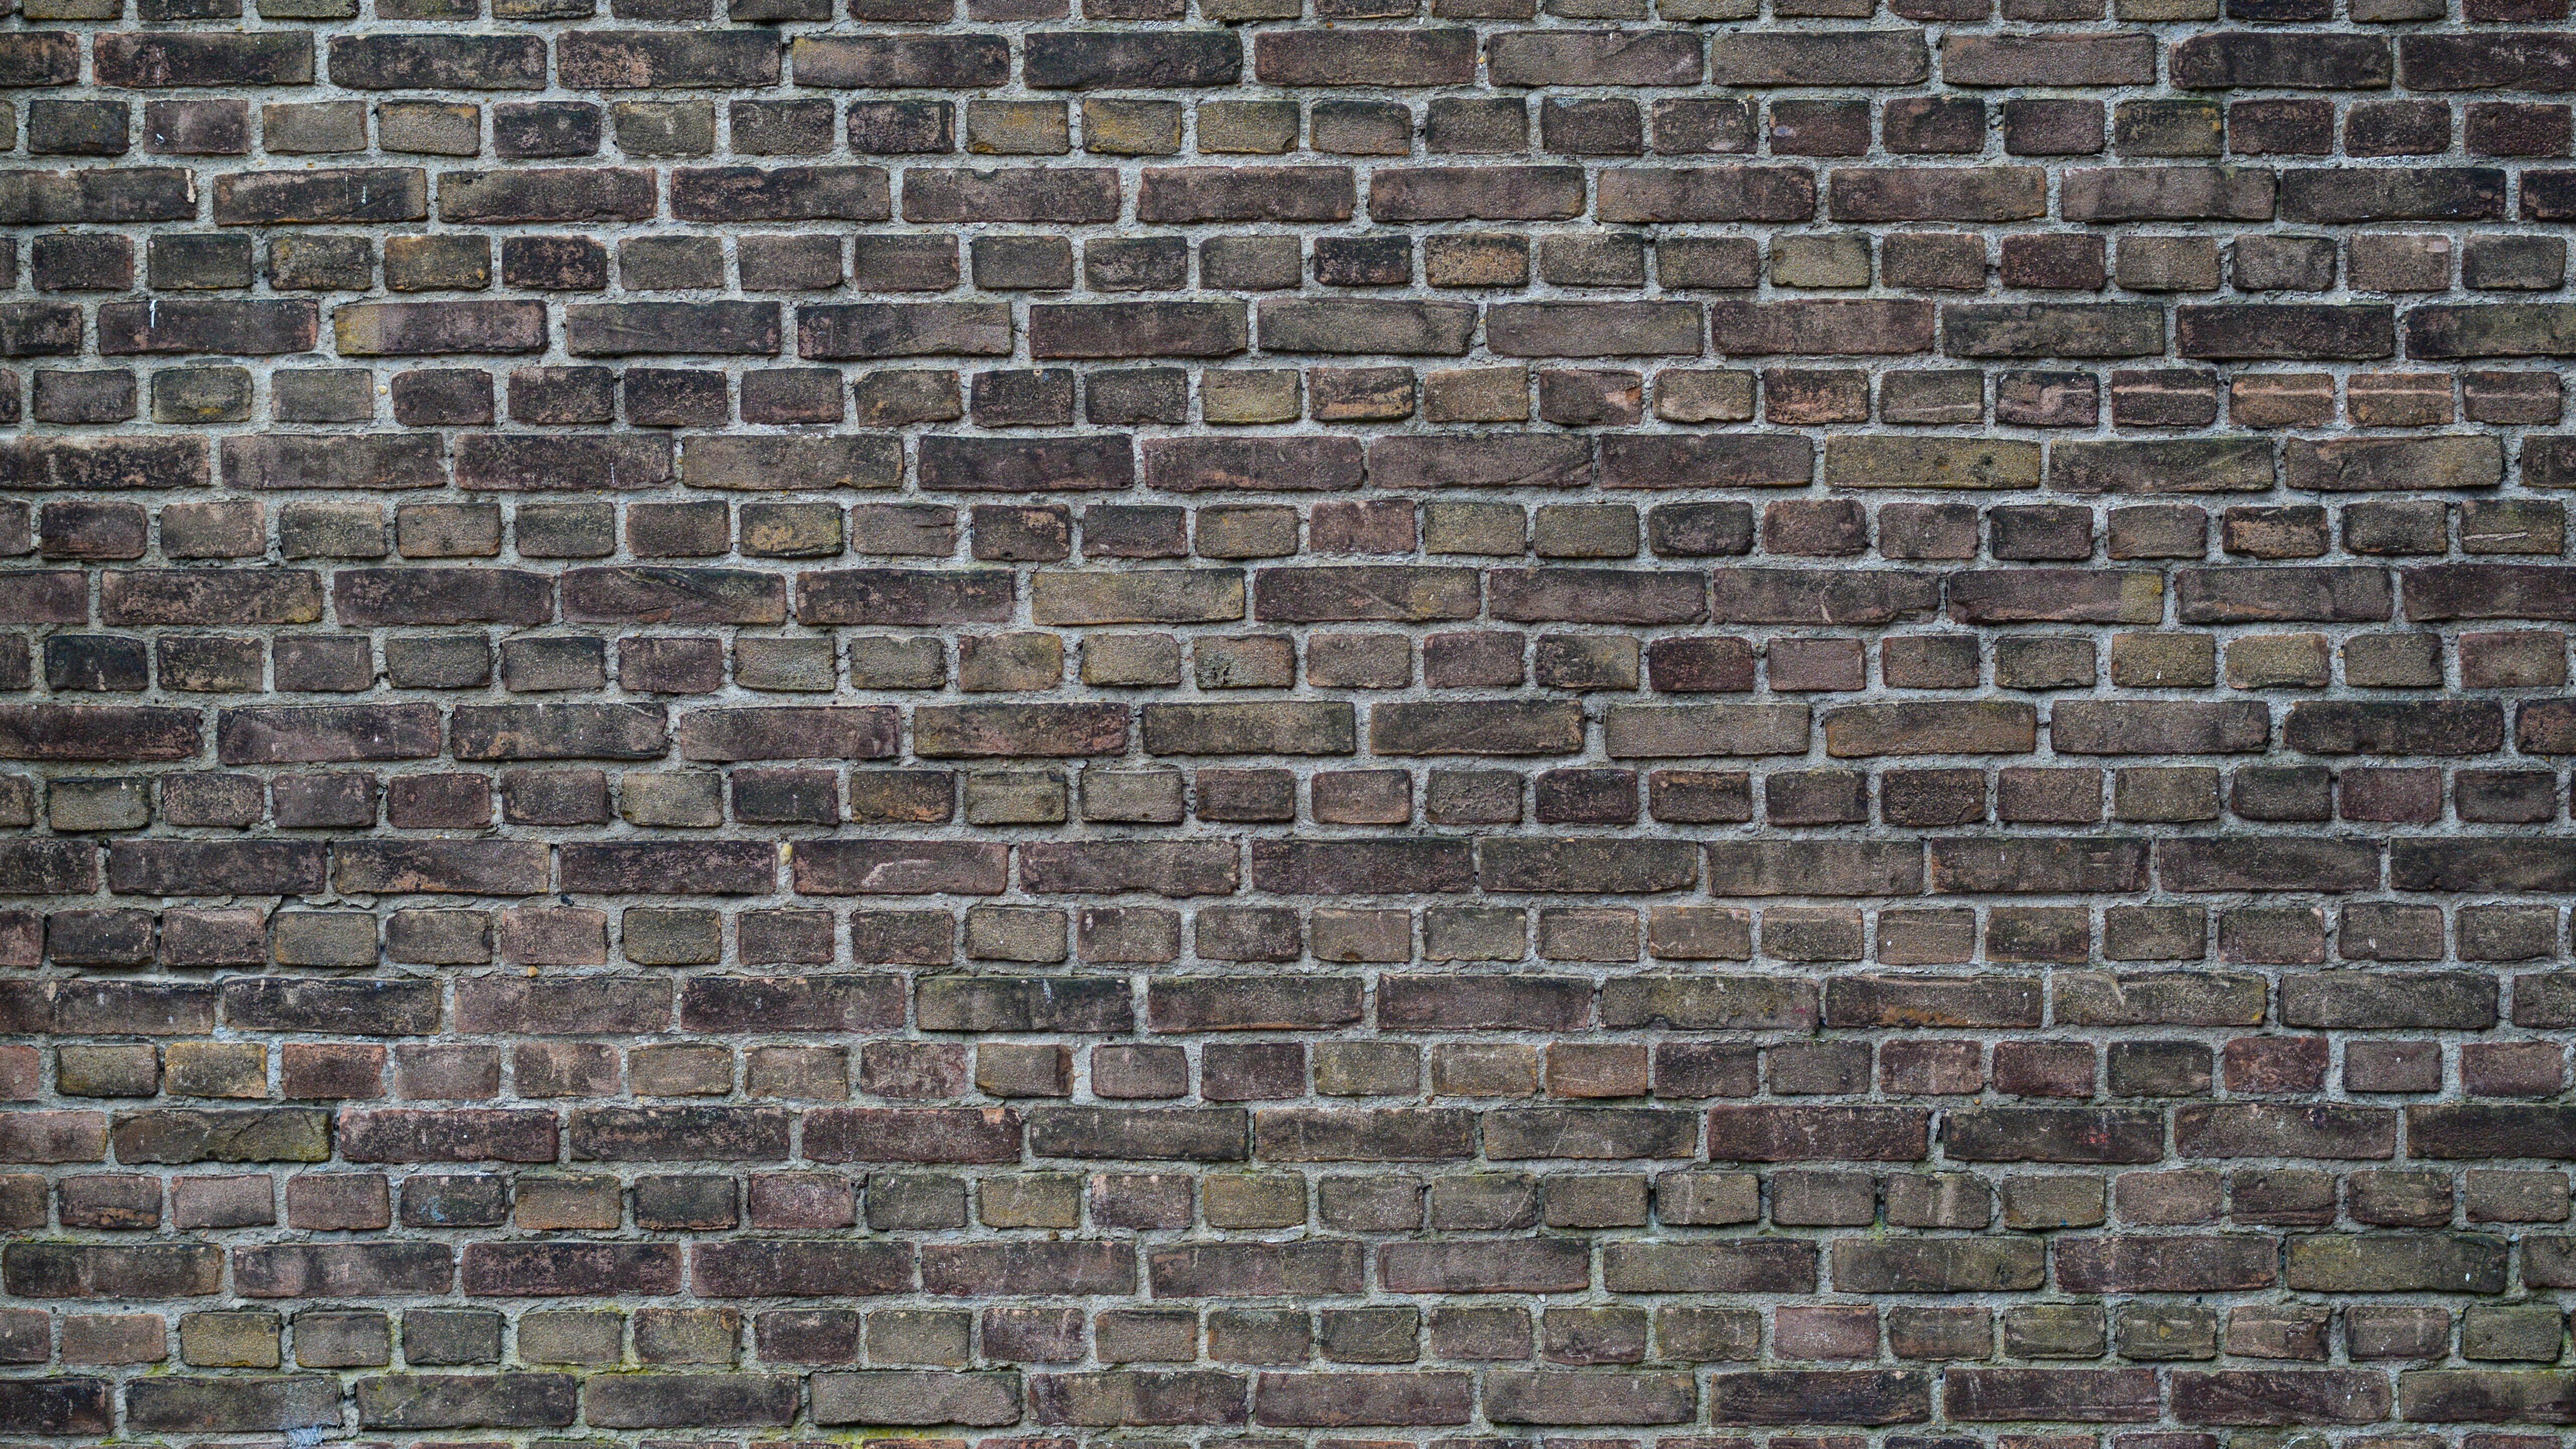 brick-wall-5k-cg.jpg